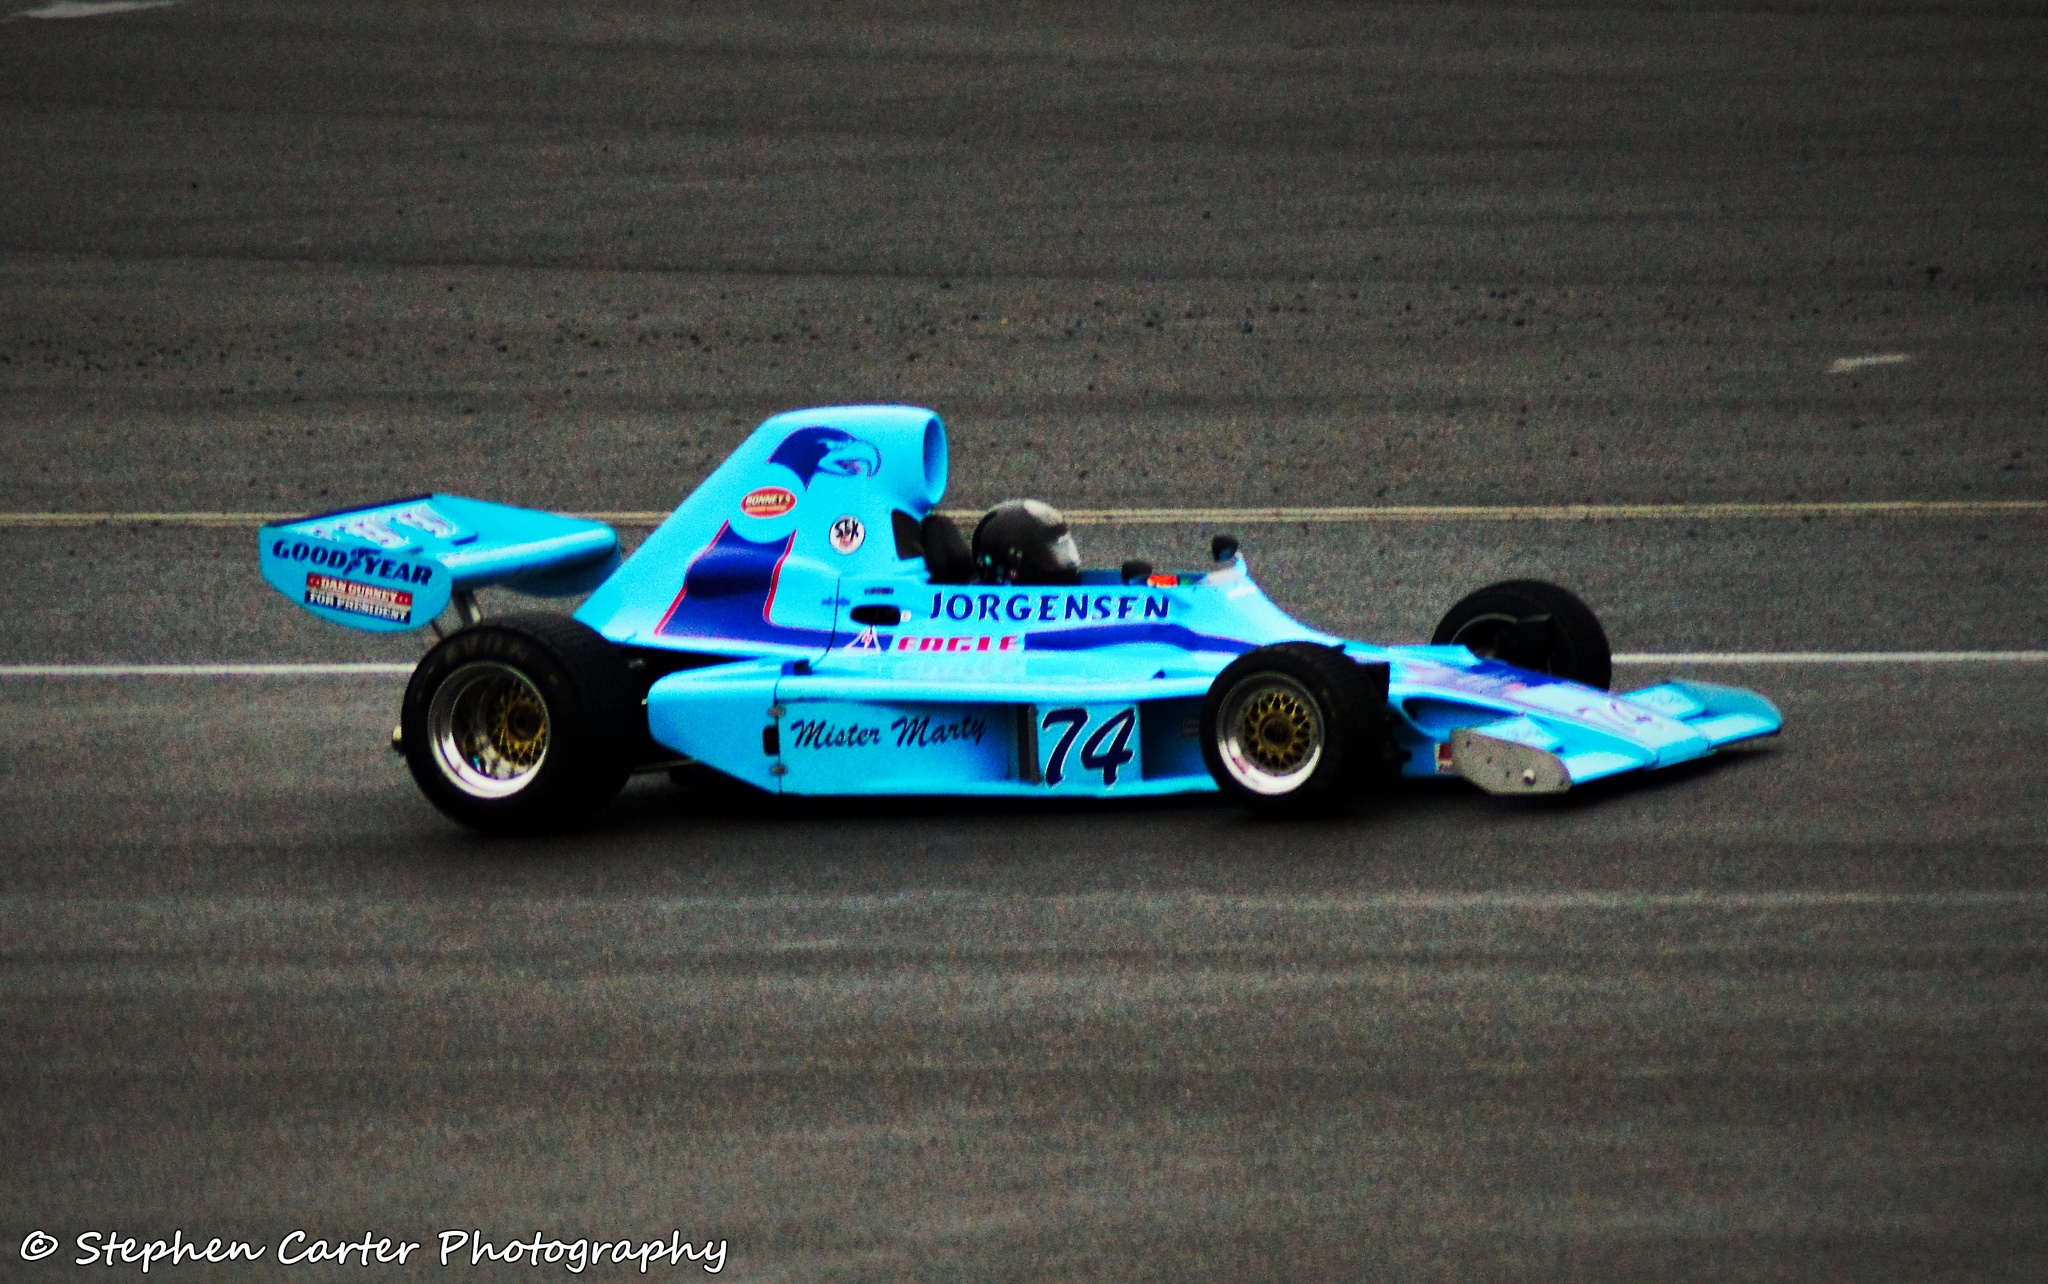 1974 Jorgensen Eagle 74A Formula 5000 by Stephen Carter Photography